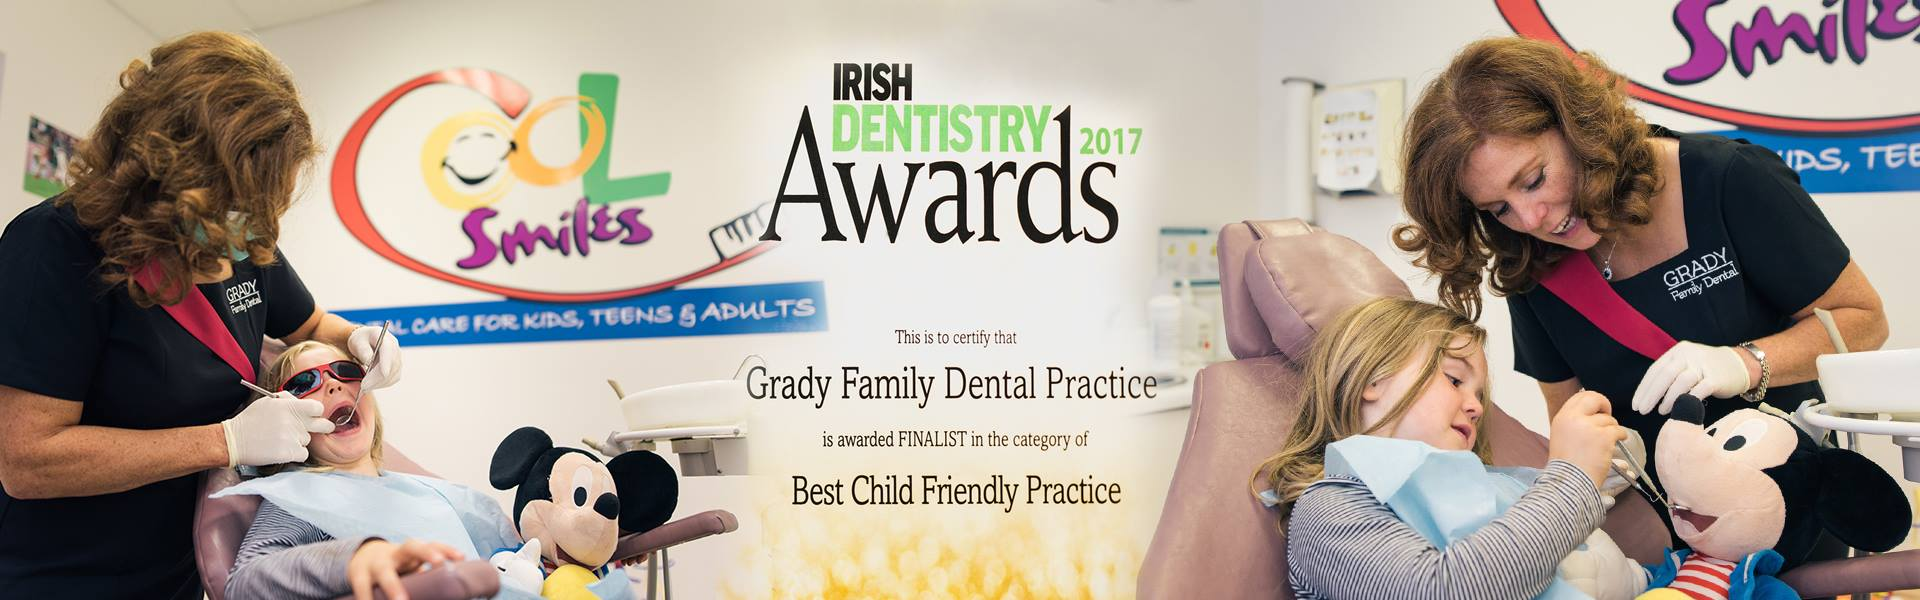 Grady Family Dental Practice - banner2